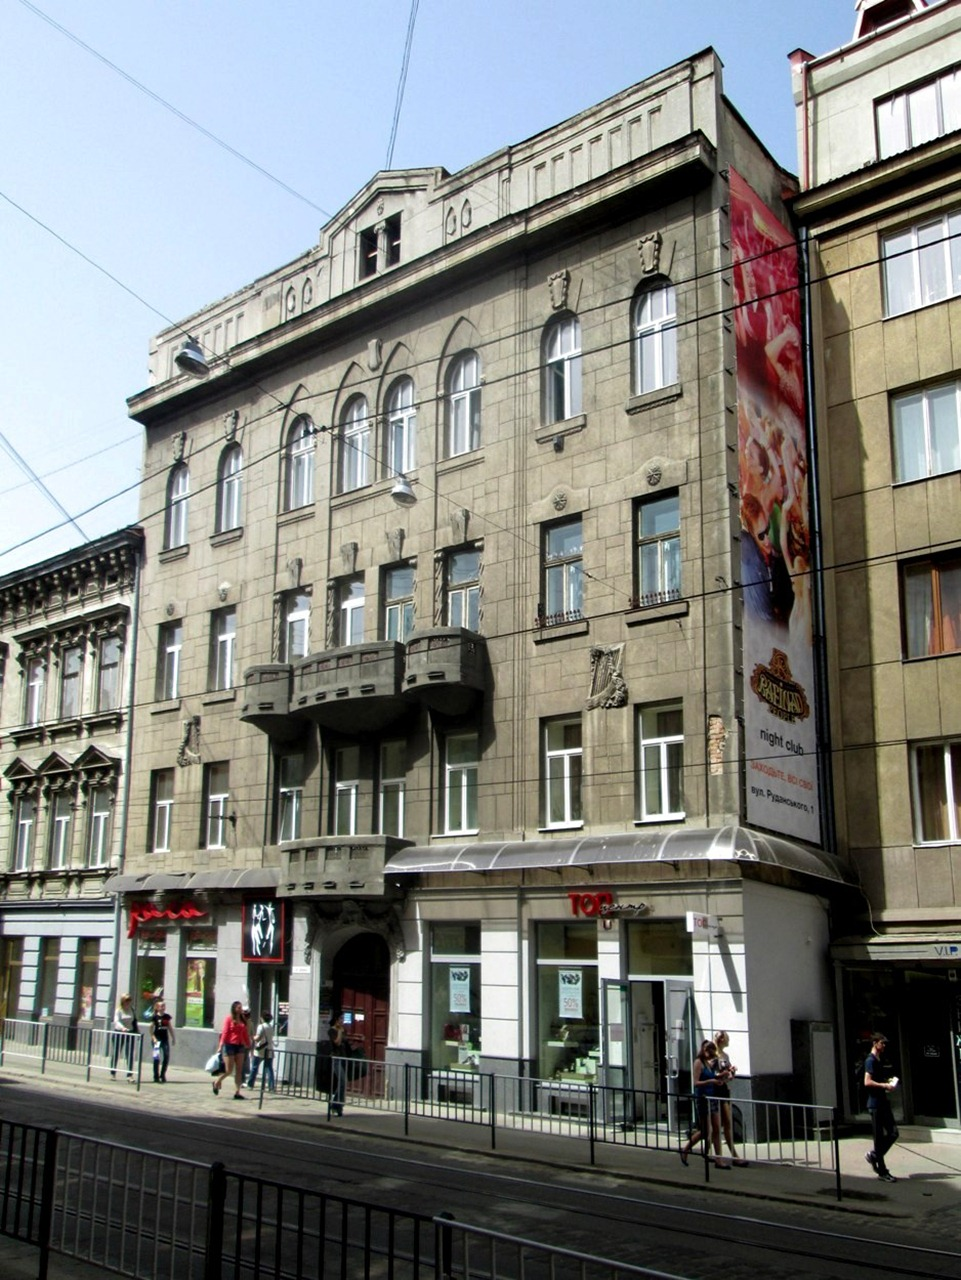 Житловий будинок на вул. Дорошенка №14